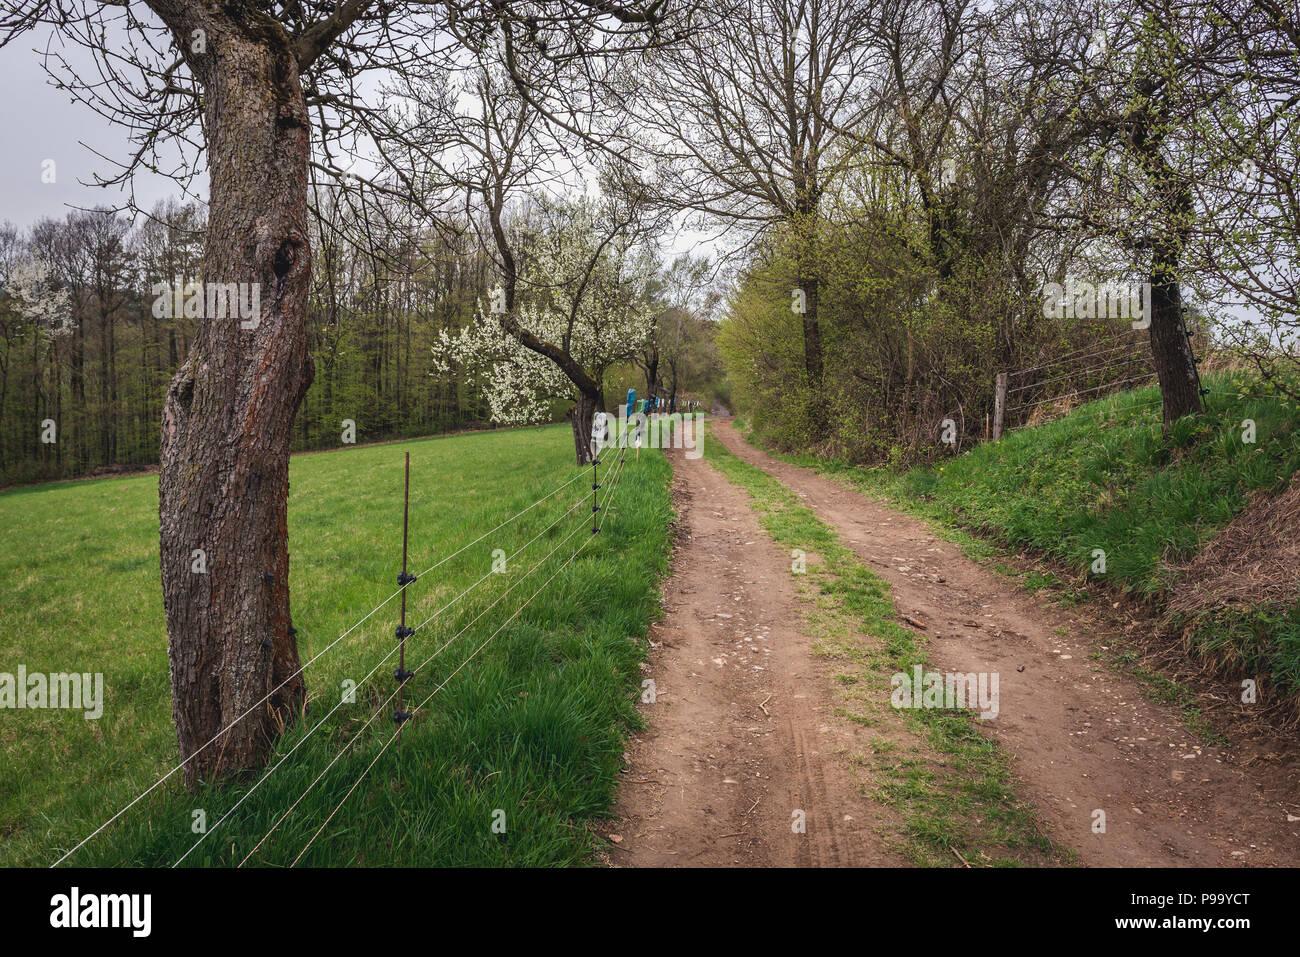 Country road near Jaroslavice district of Zlin city in Czech Republic - Stock Image